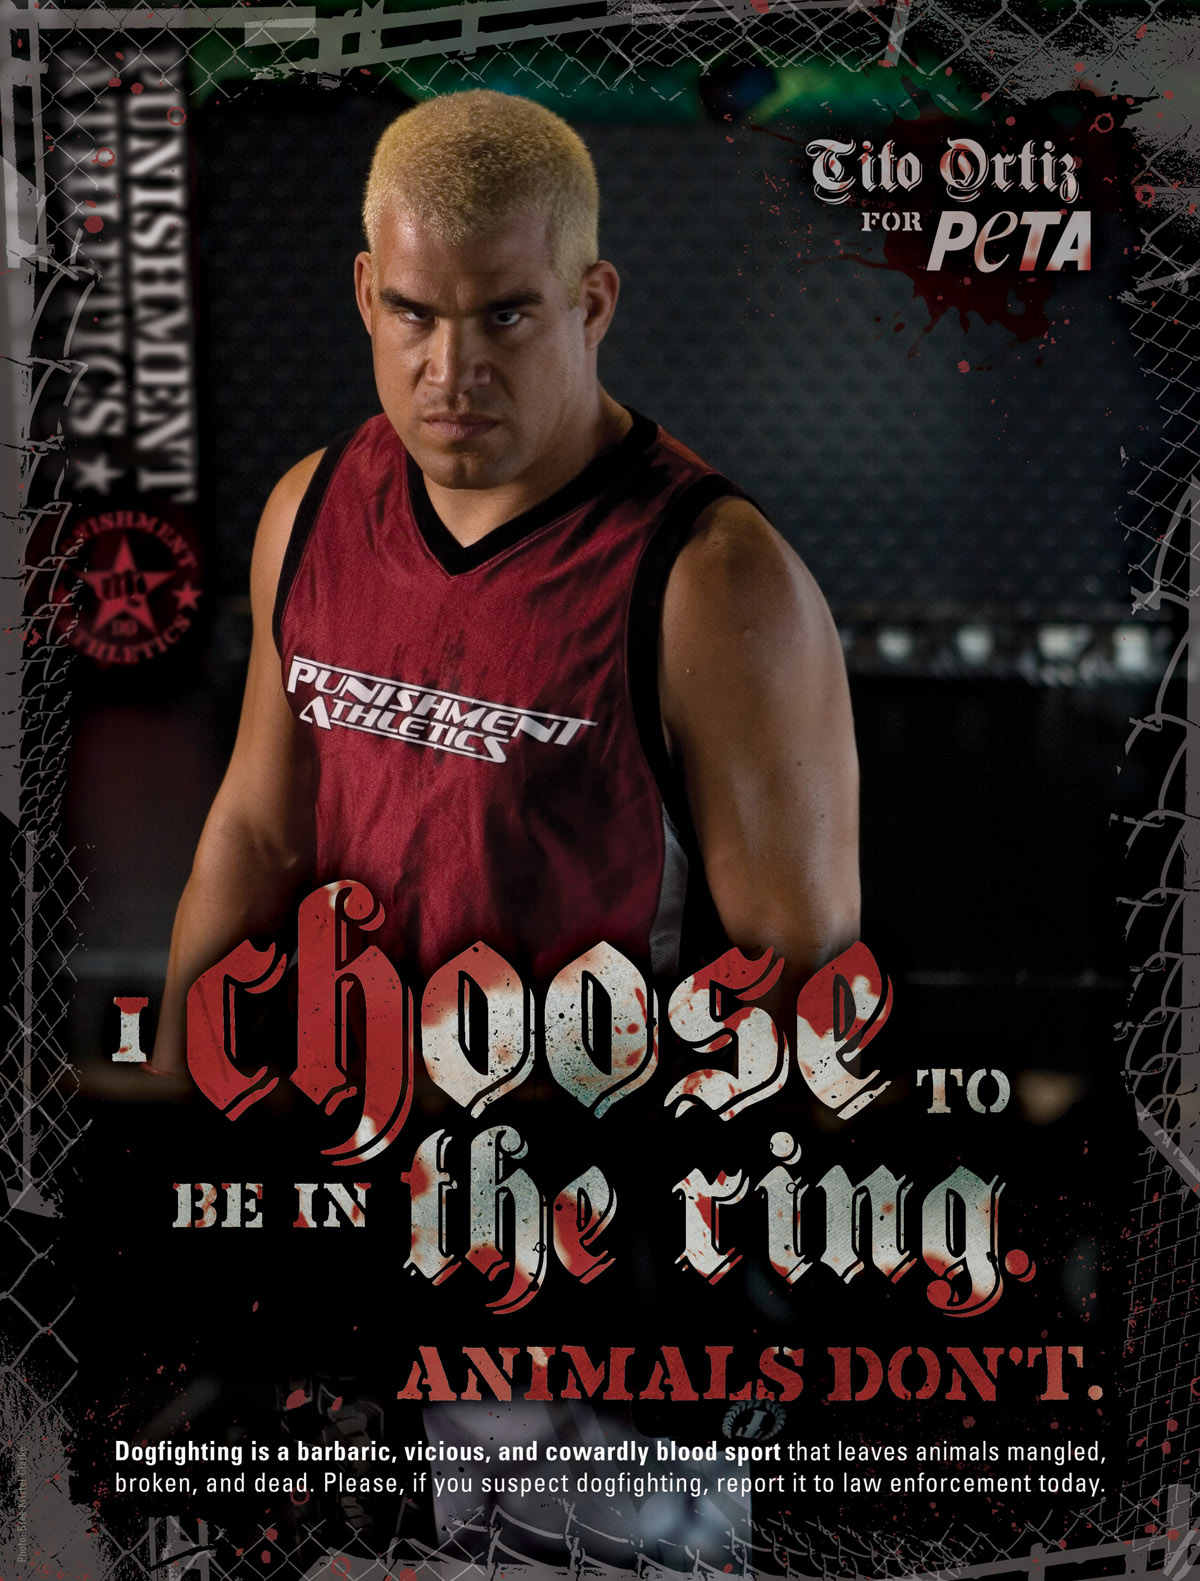 Tito Ortiz's Anti-Dogfighting Ad